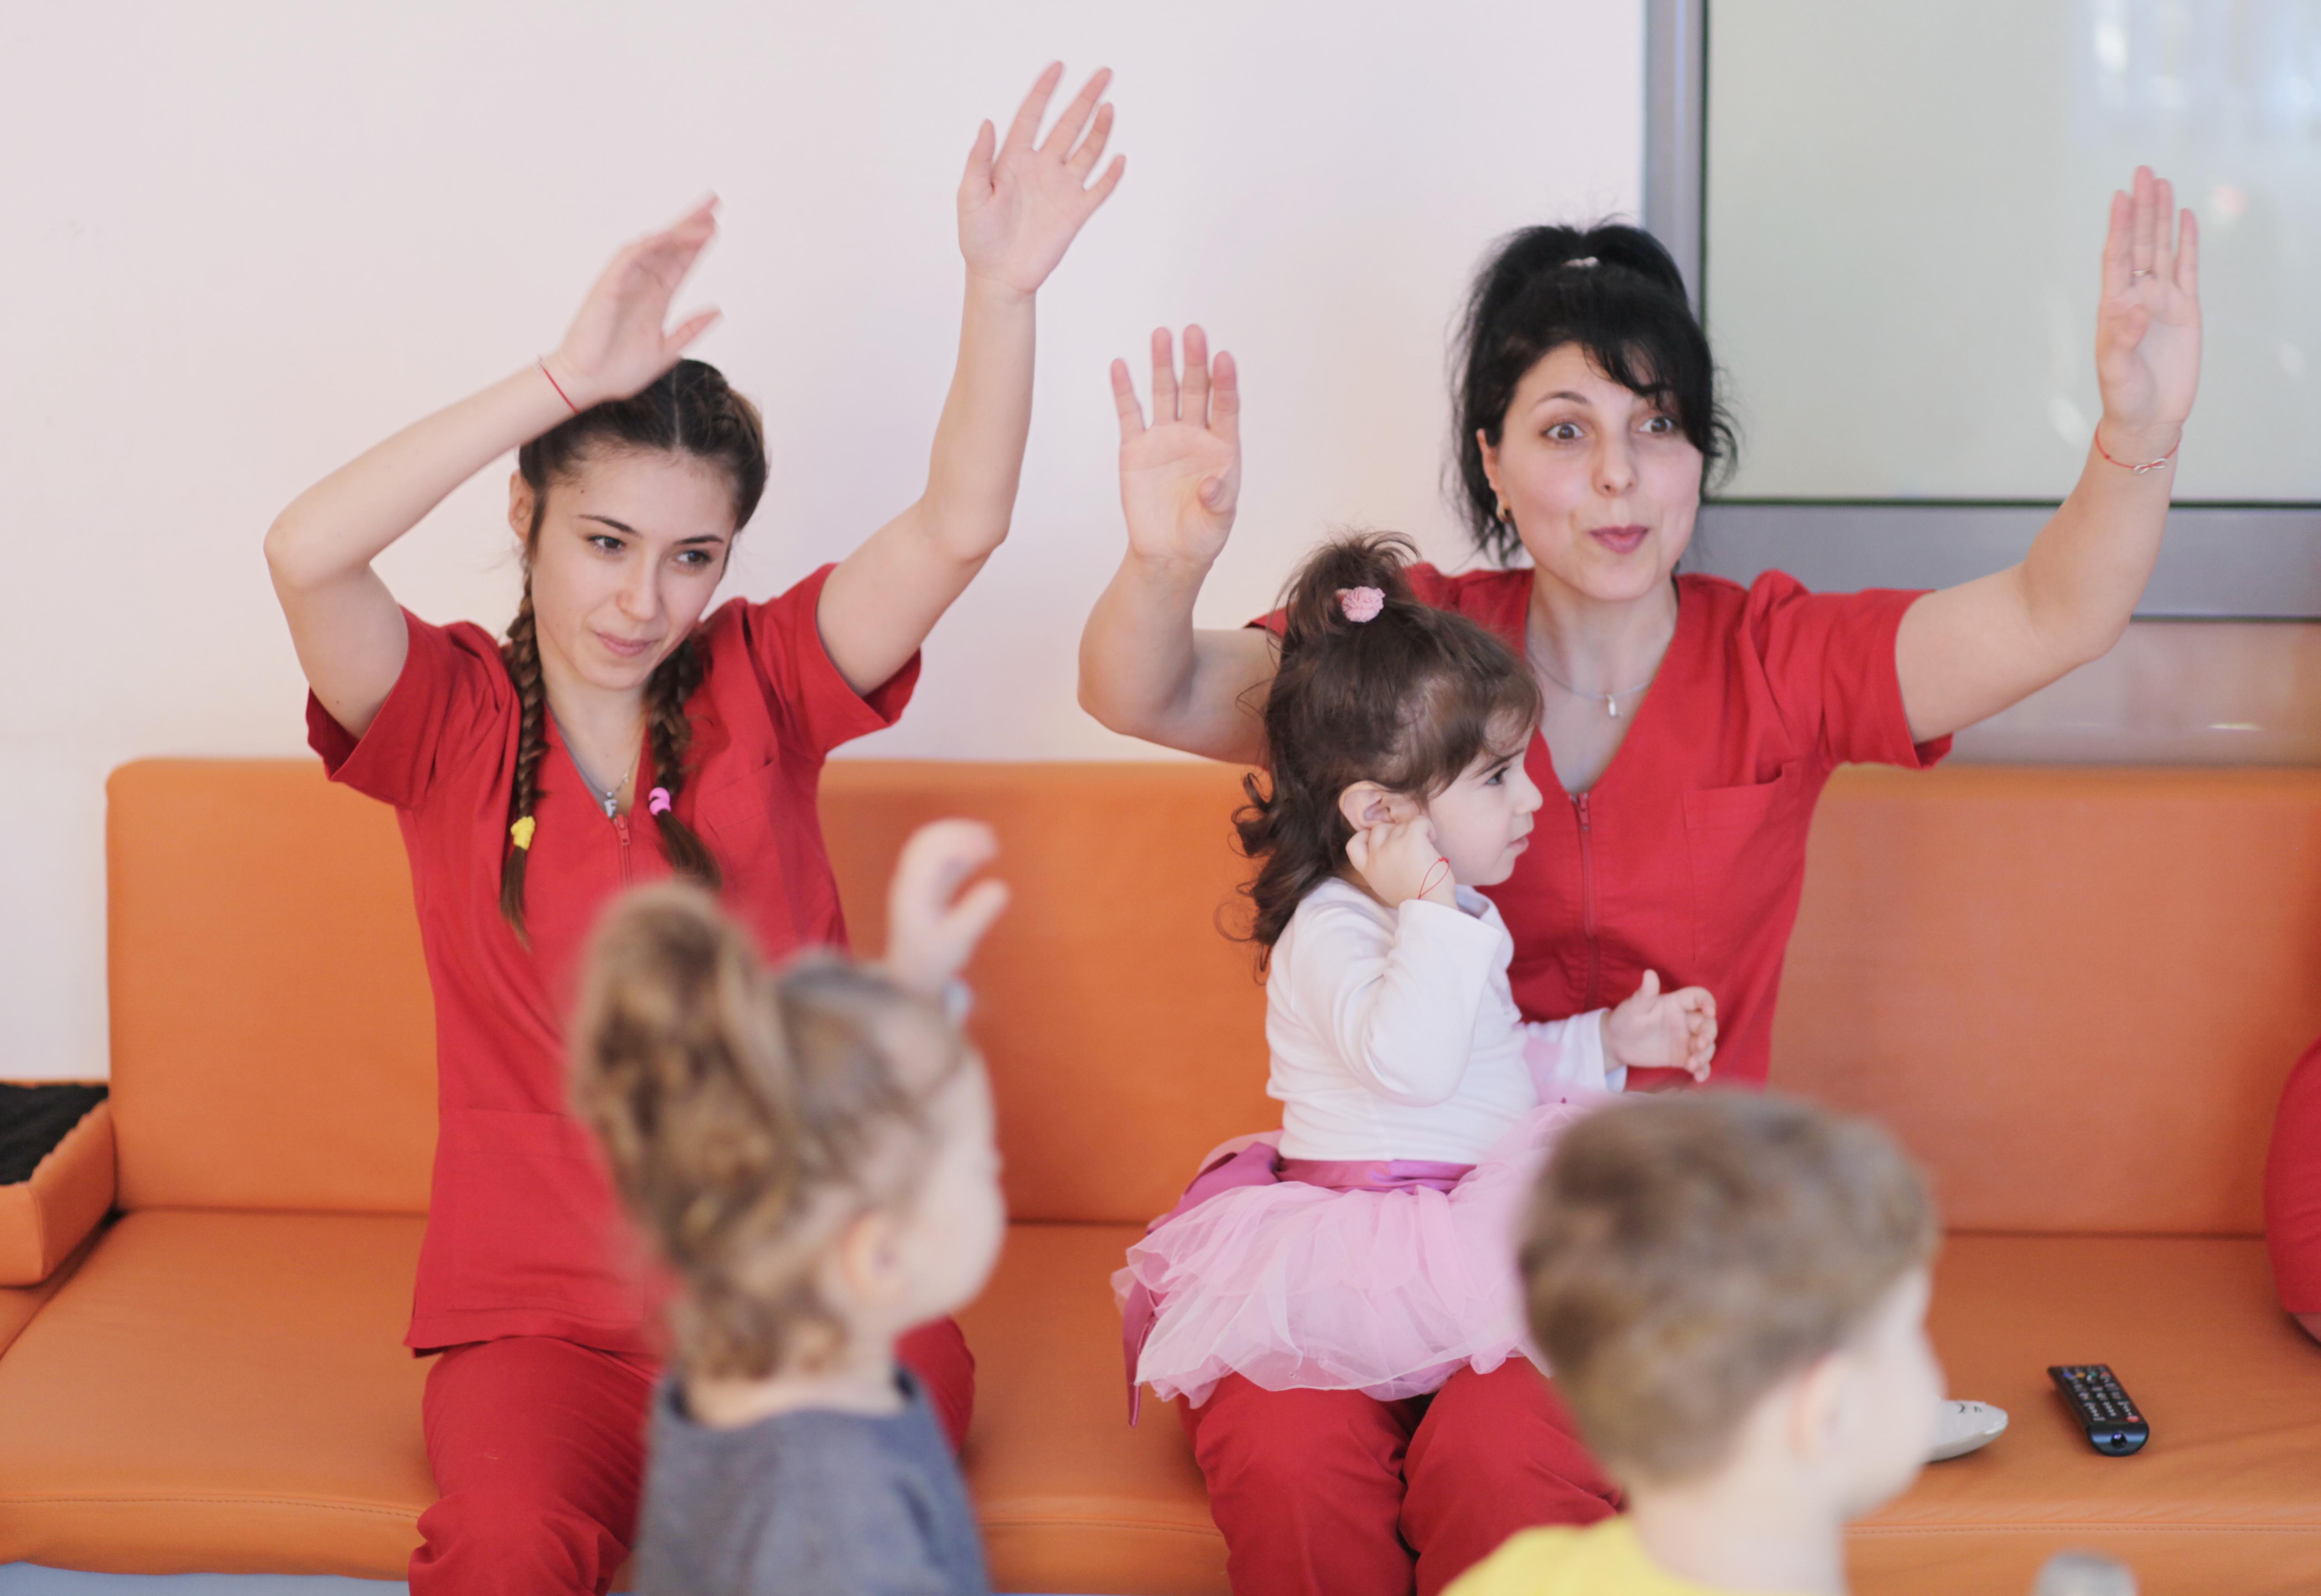 quality preschool programs support teachers